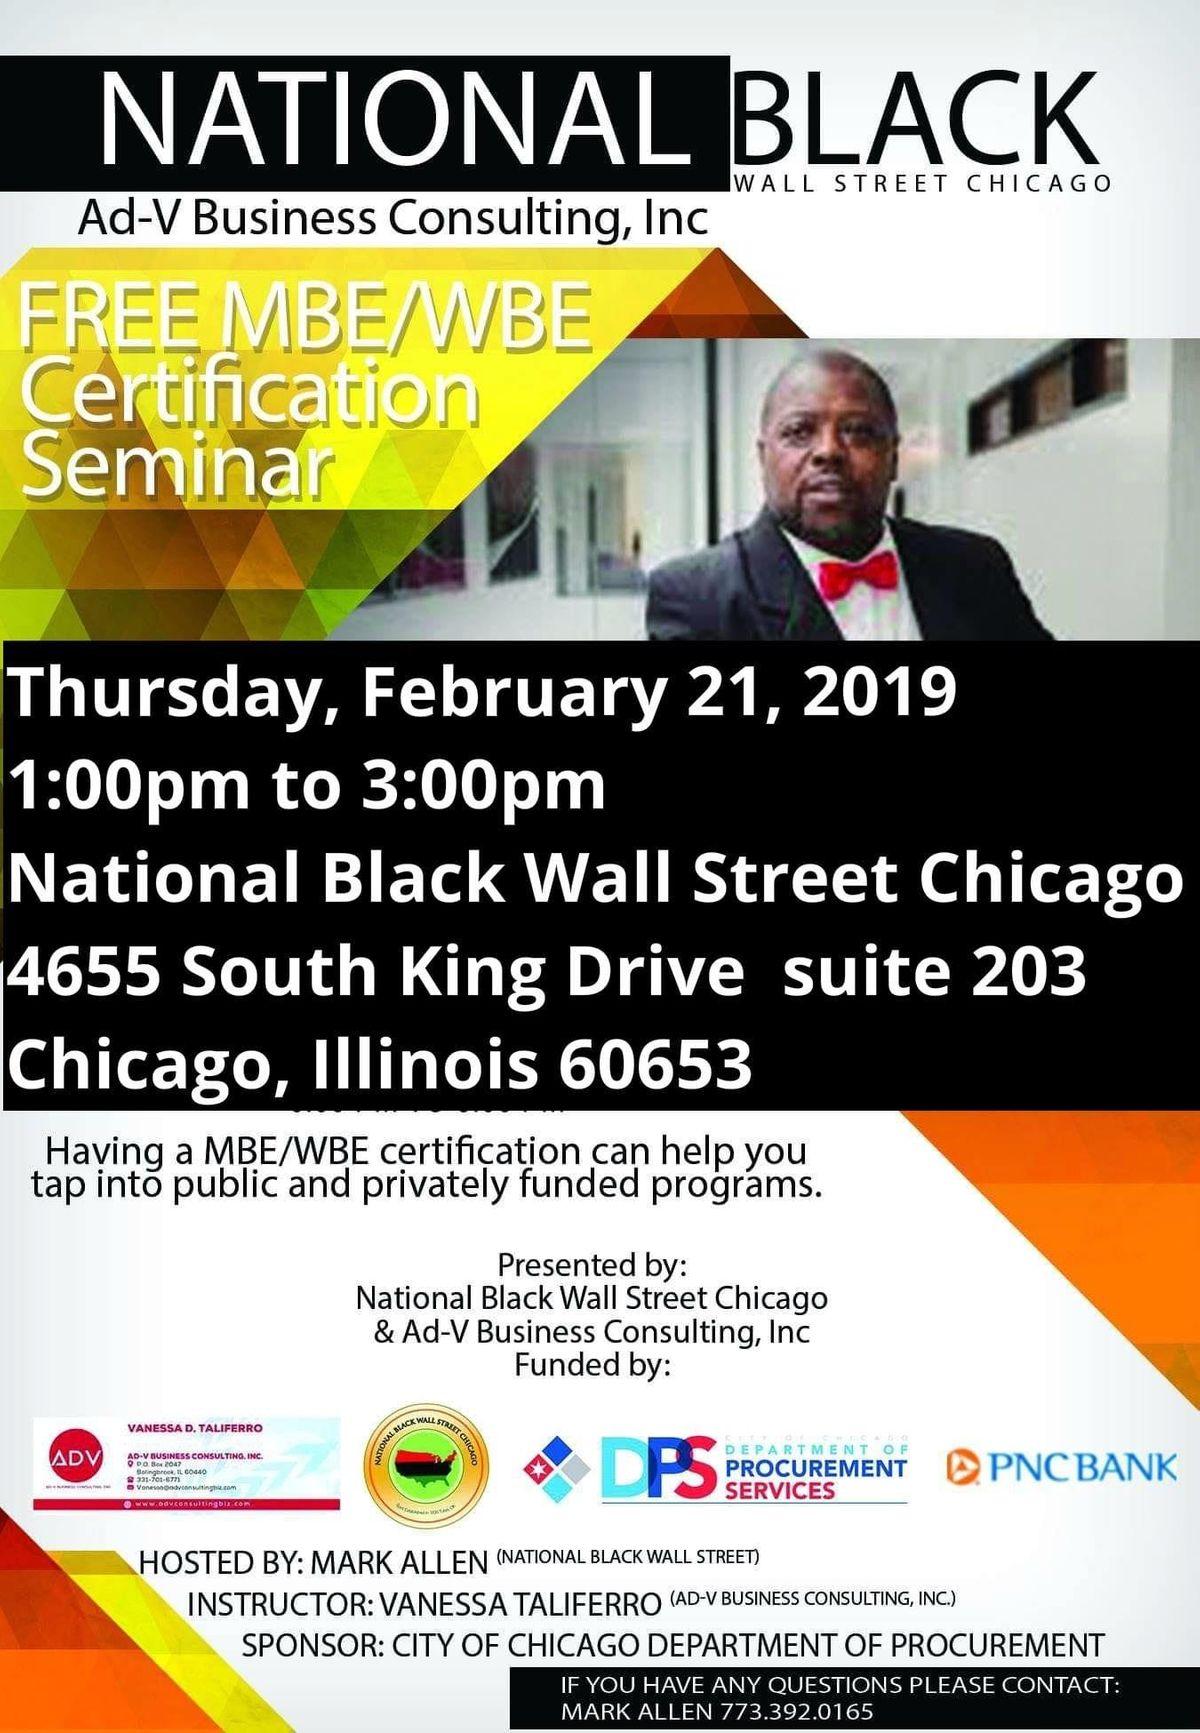 Free Mbe Wbe Certification Seminar At National Black Wall Street